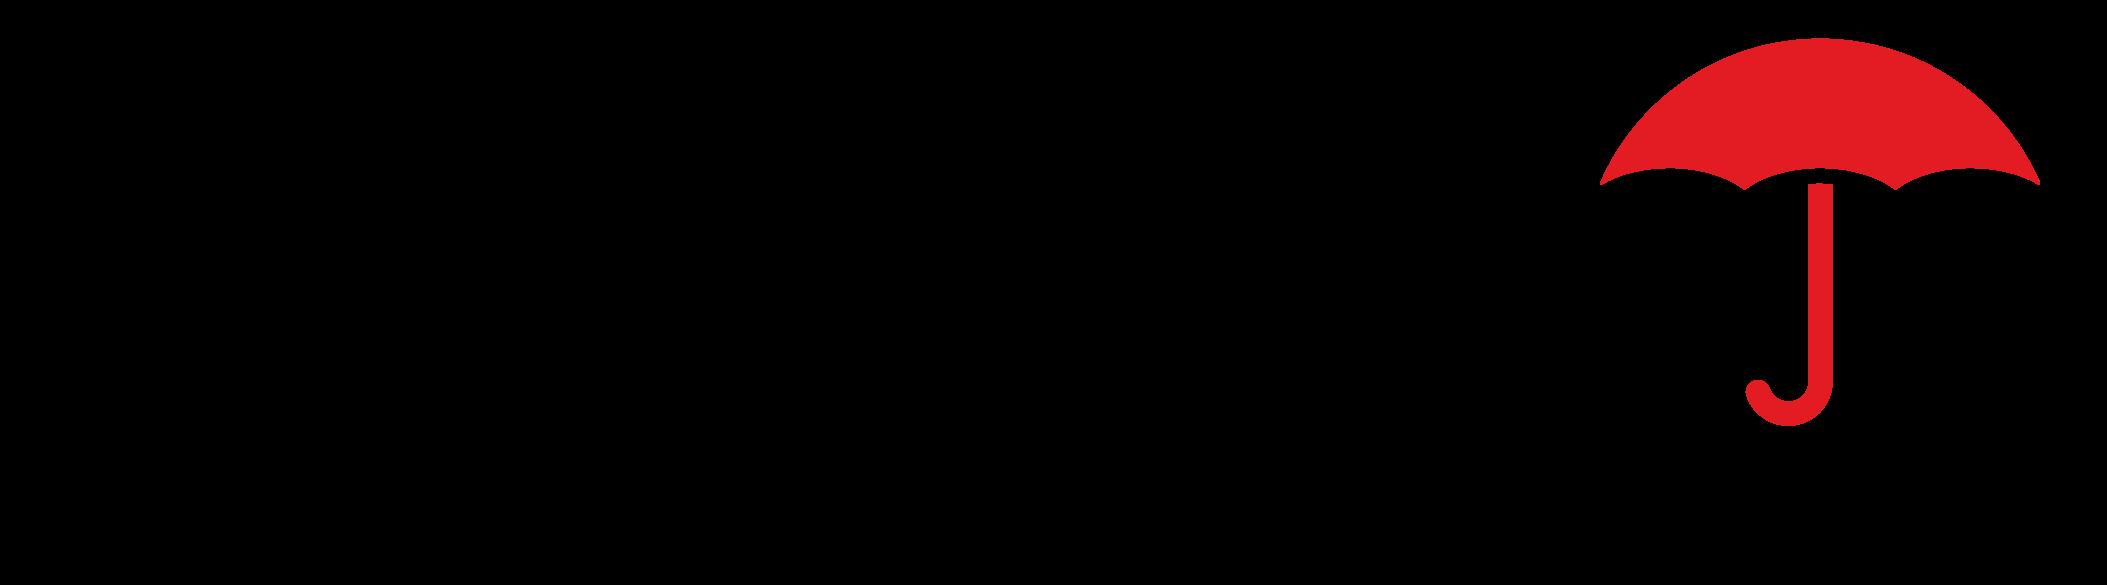 Travelers Companies logo